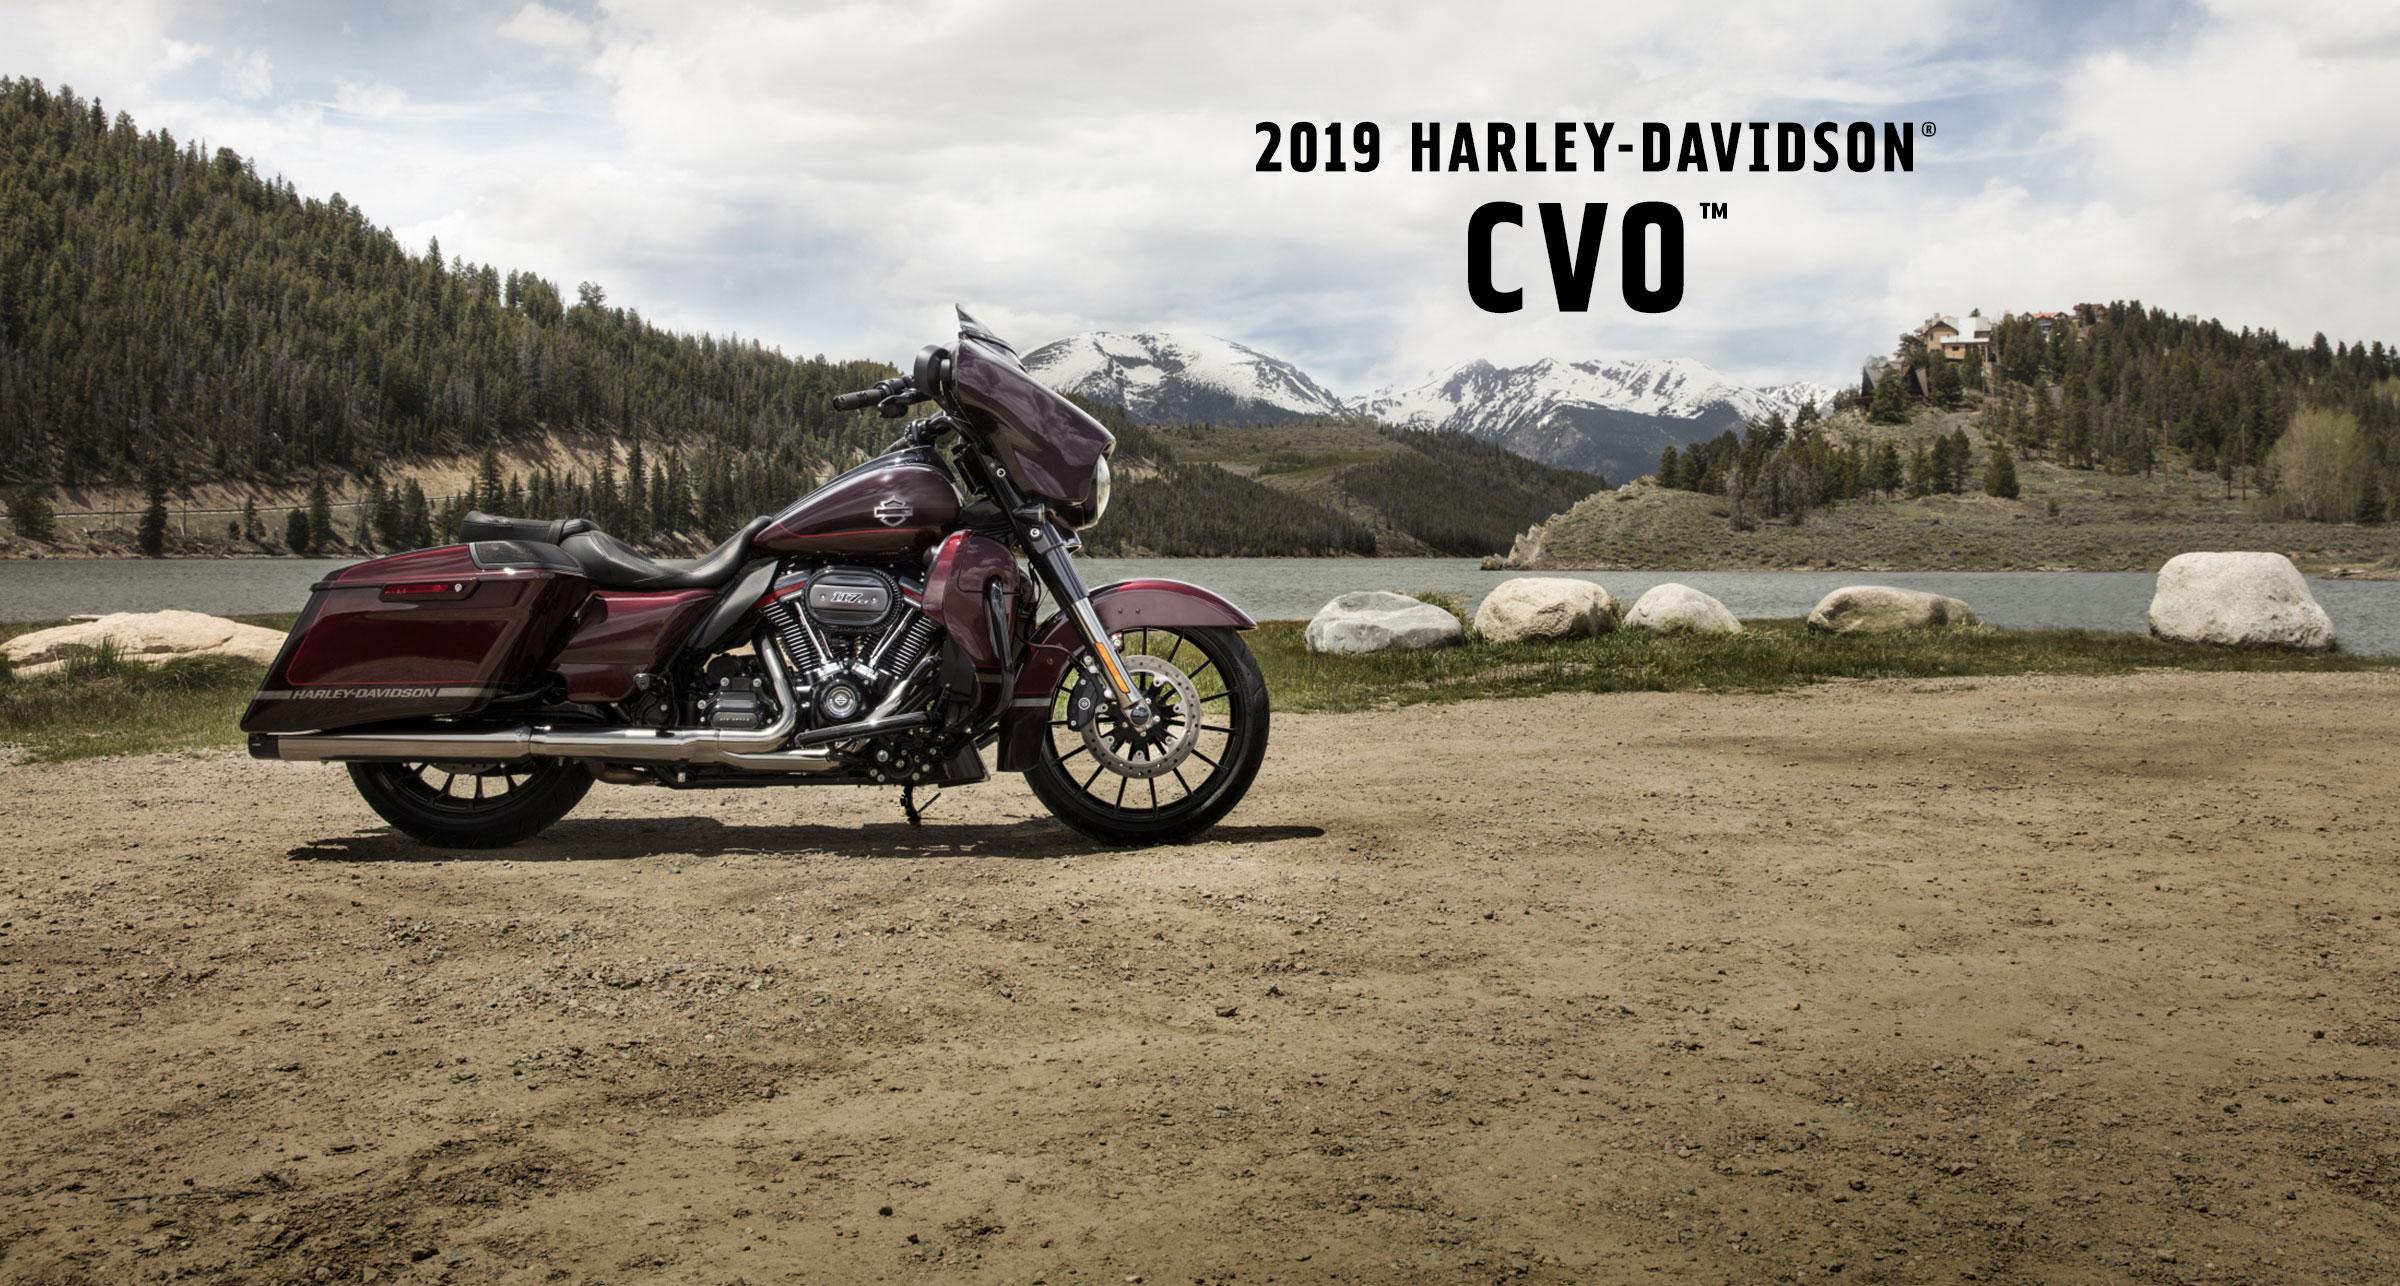 CVO™ - Motocykle 2019